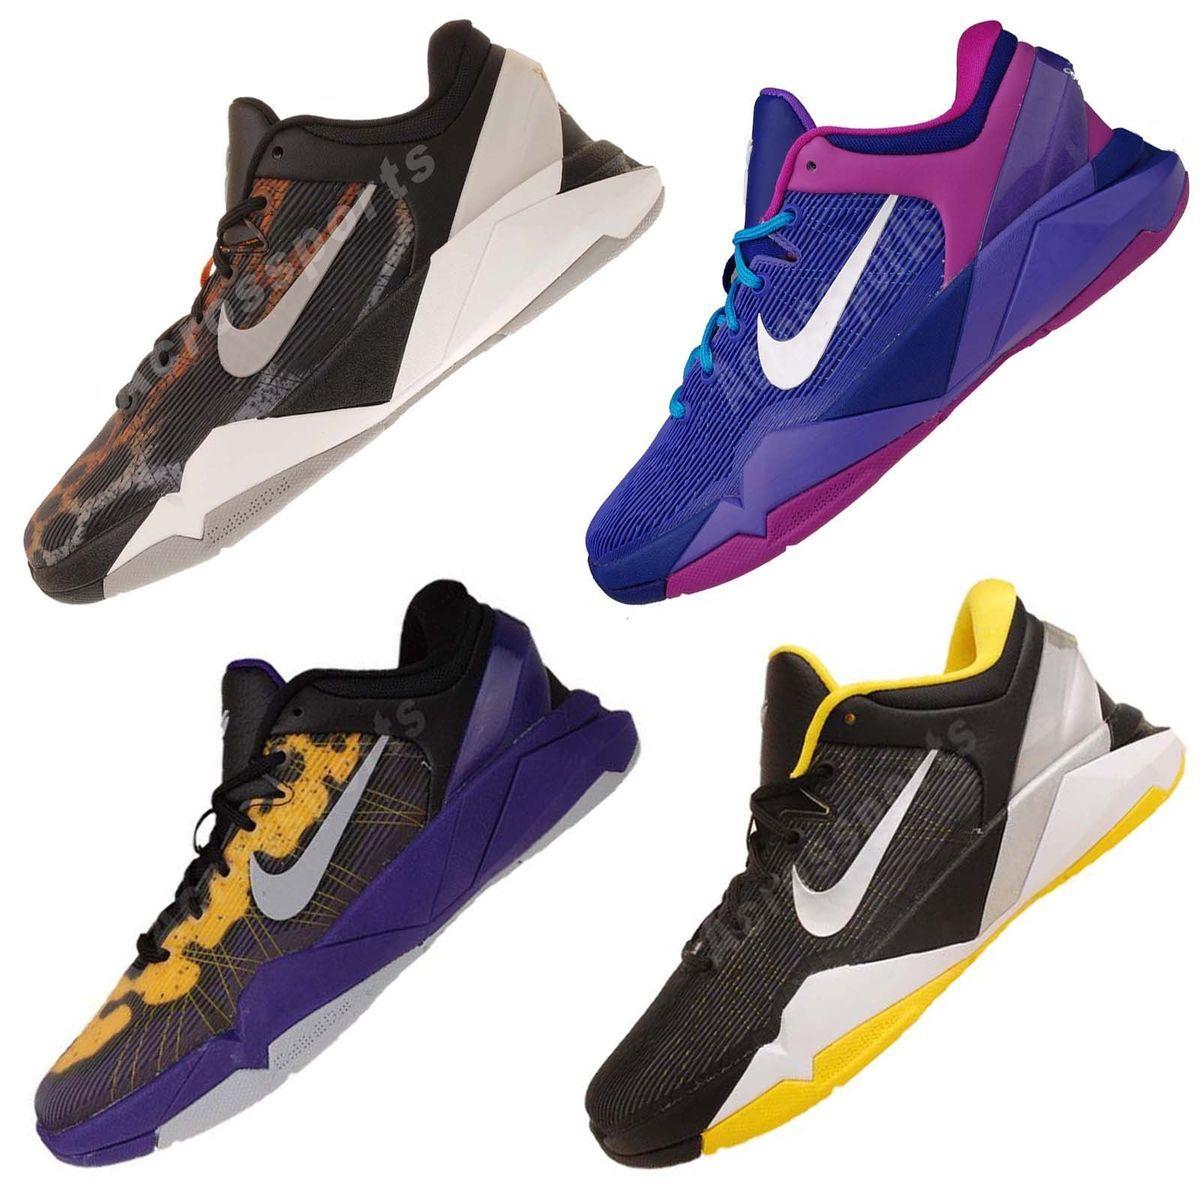 adc0d7bd7e11 Nike Kobe VII 7 GS Youth Big Kids Boys Girls Womens Basketball Shoes